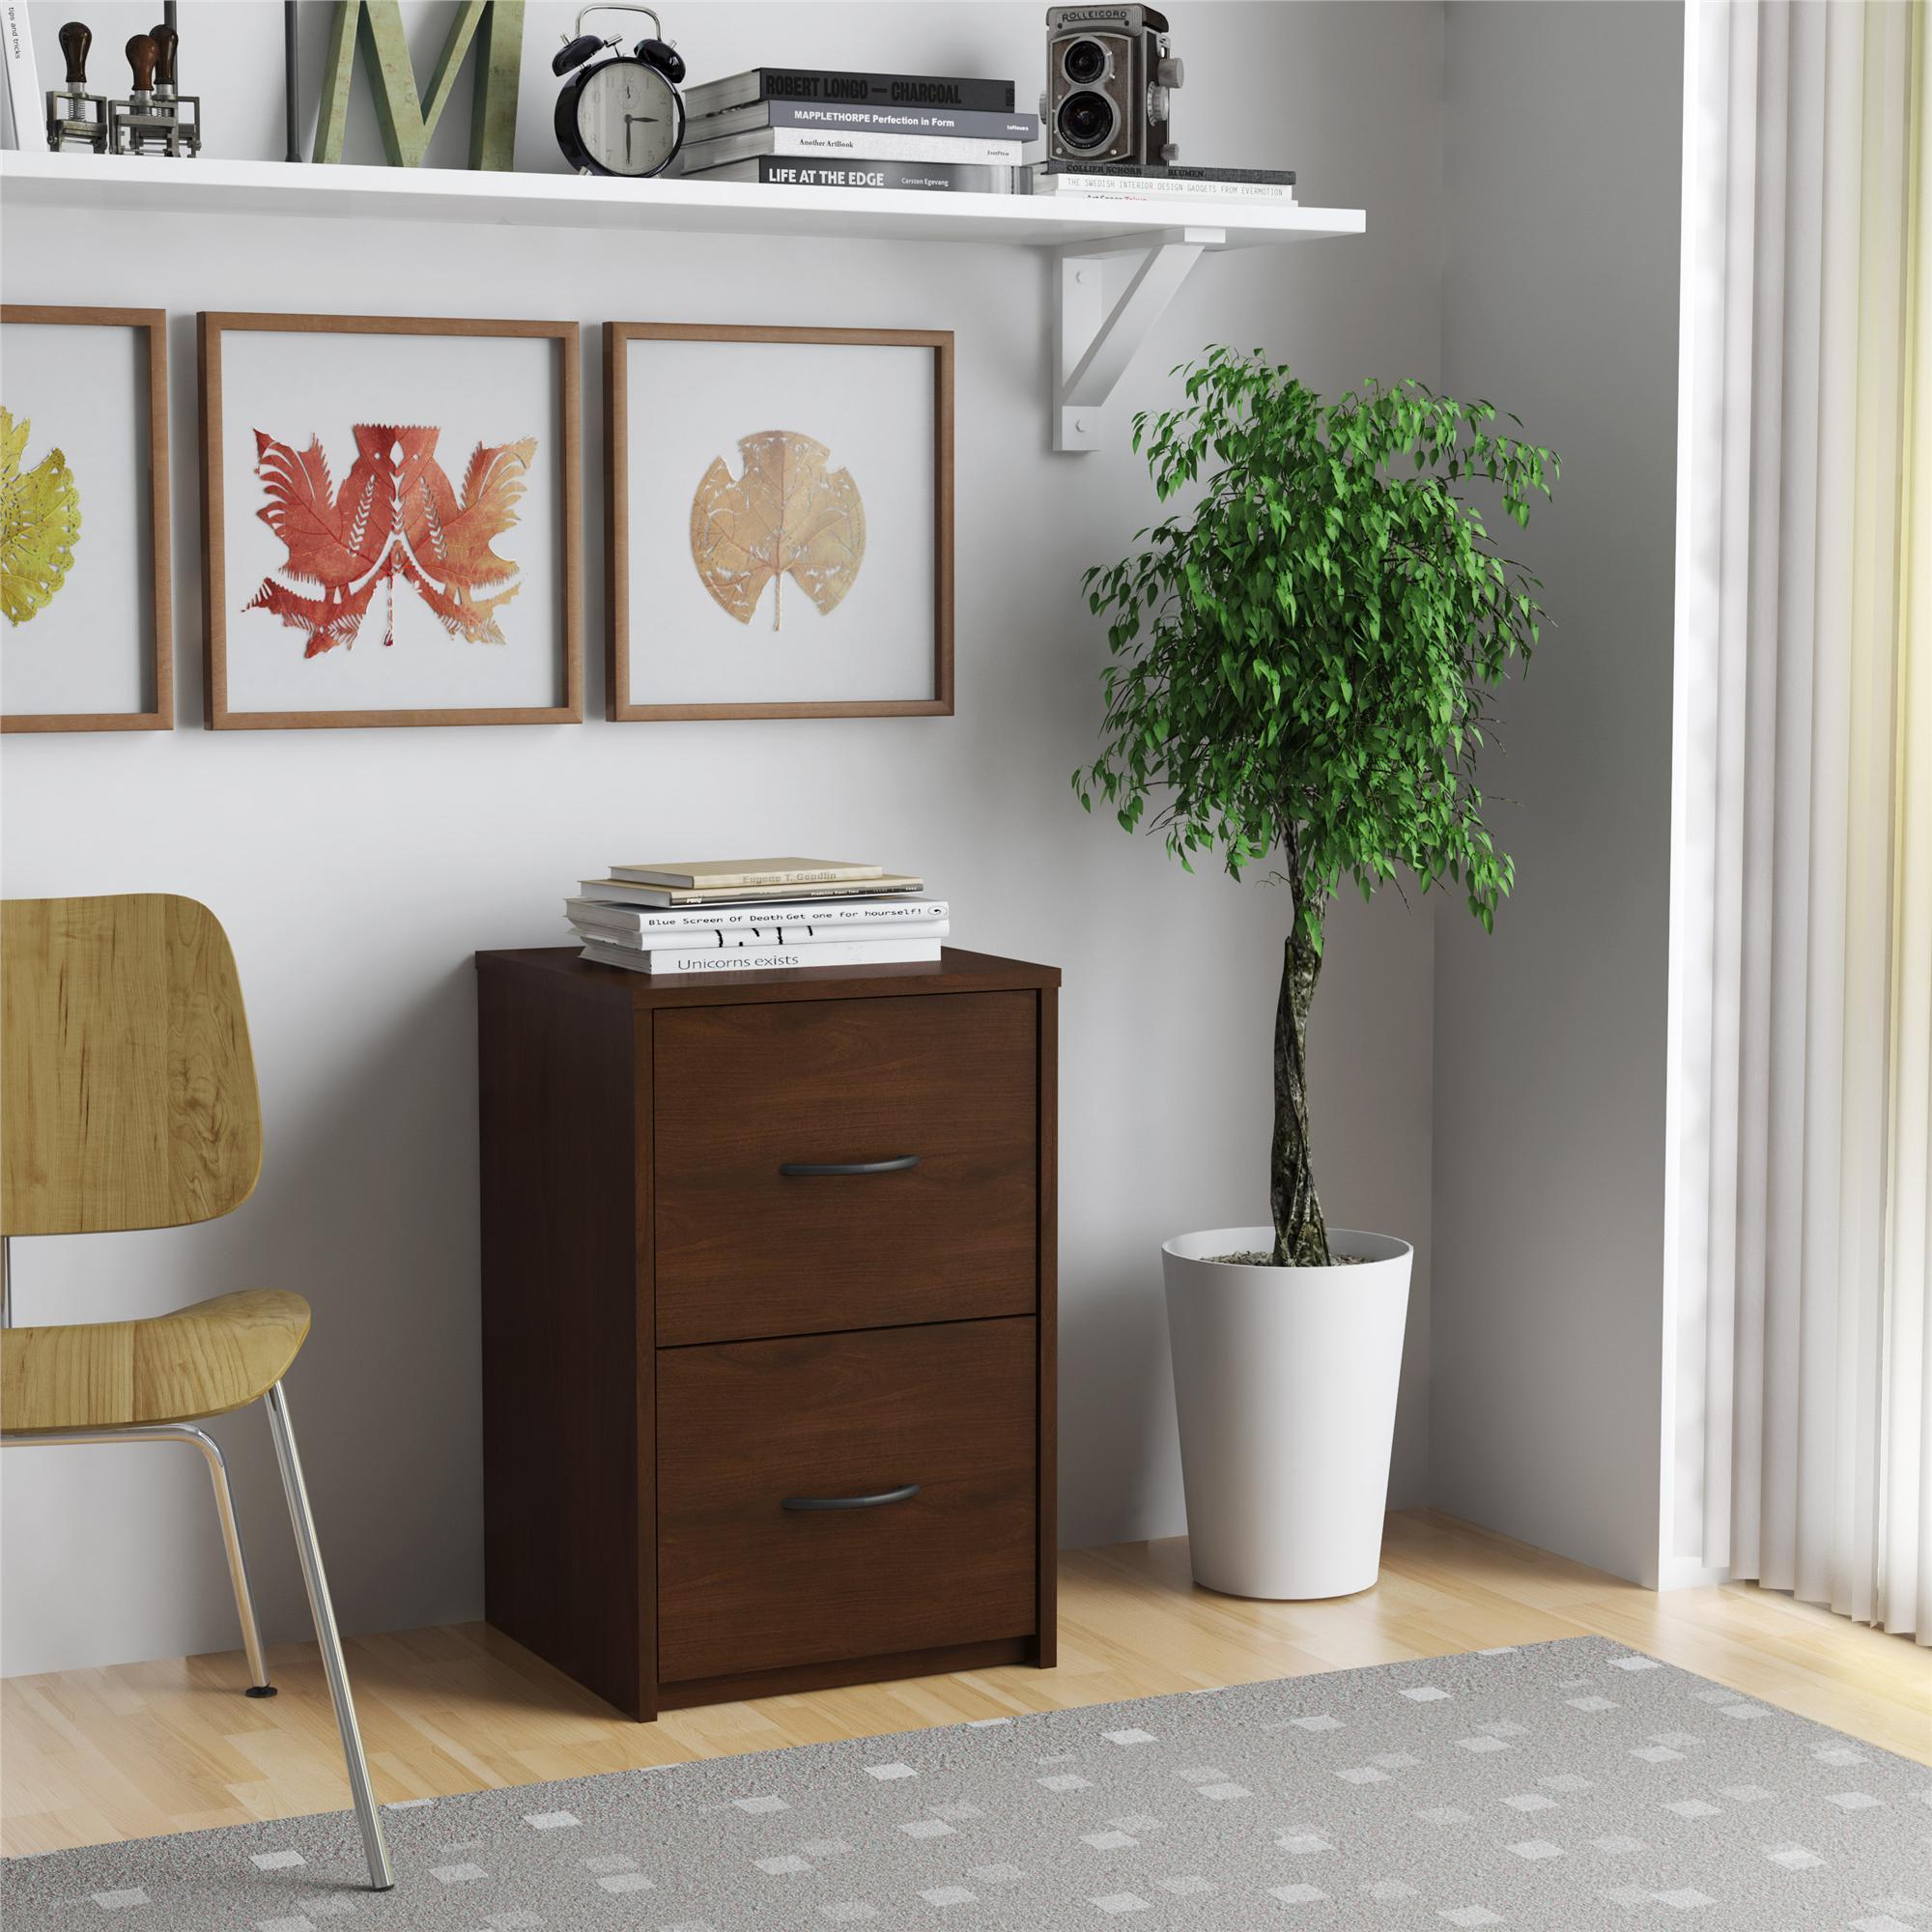 Laurel Creek Martha Cherry 2 Drawer File Cabinet